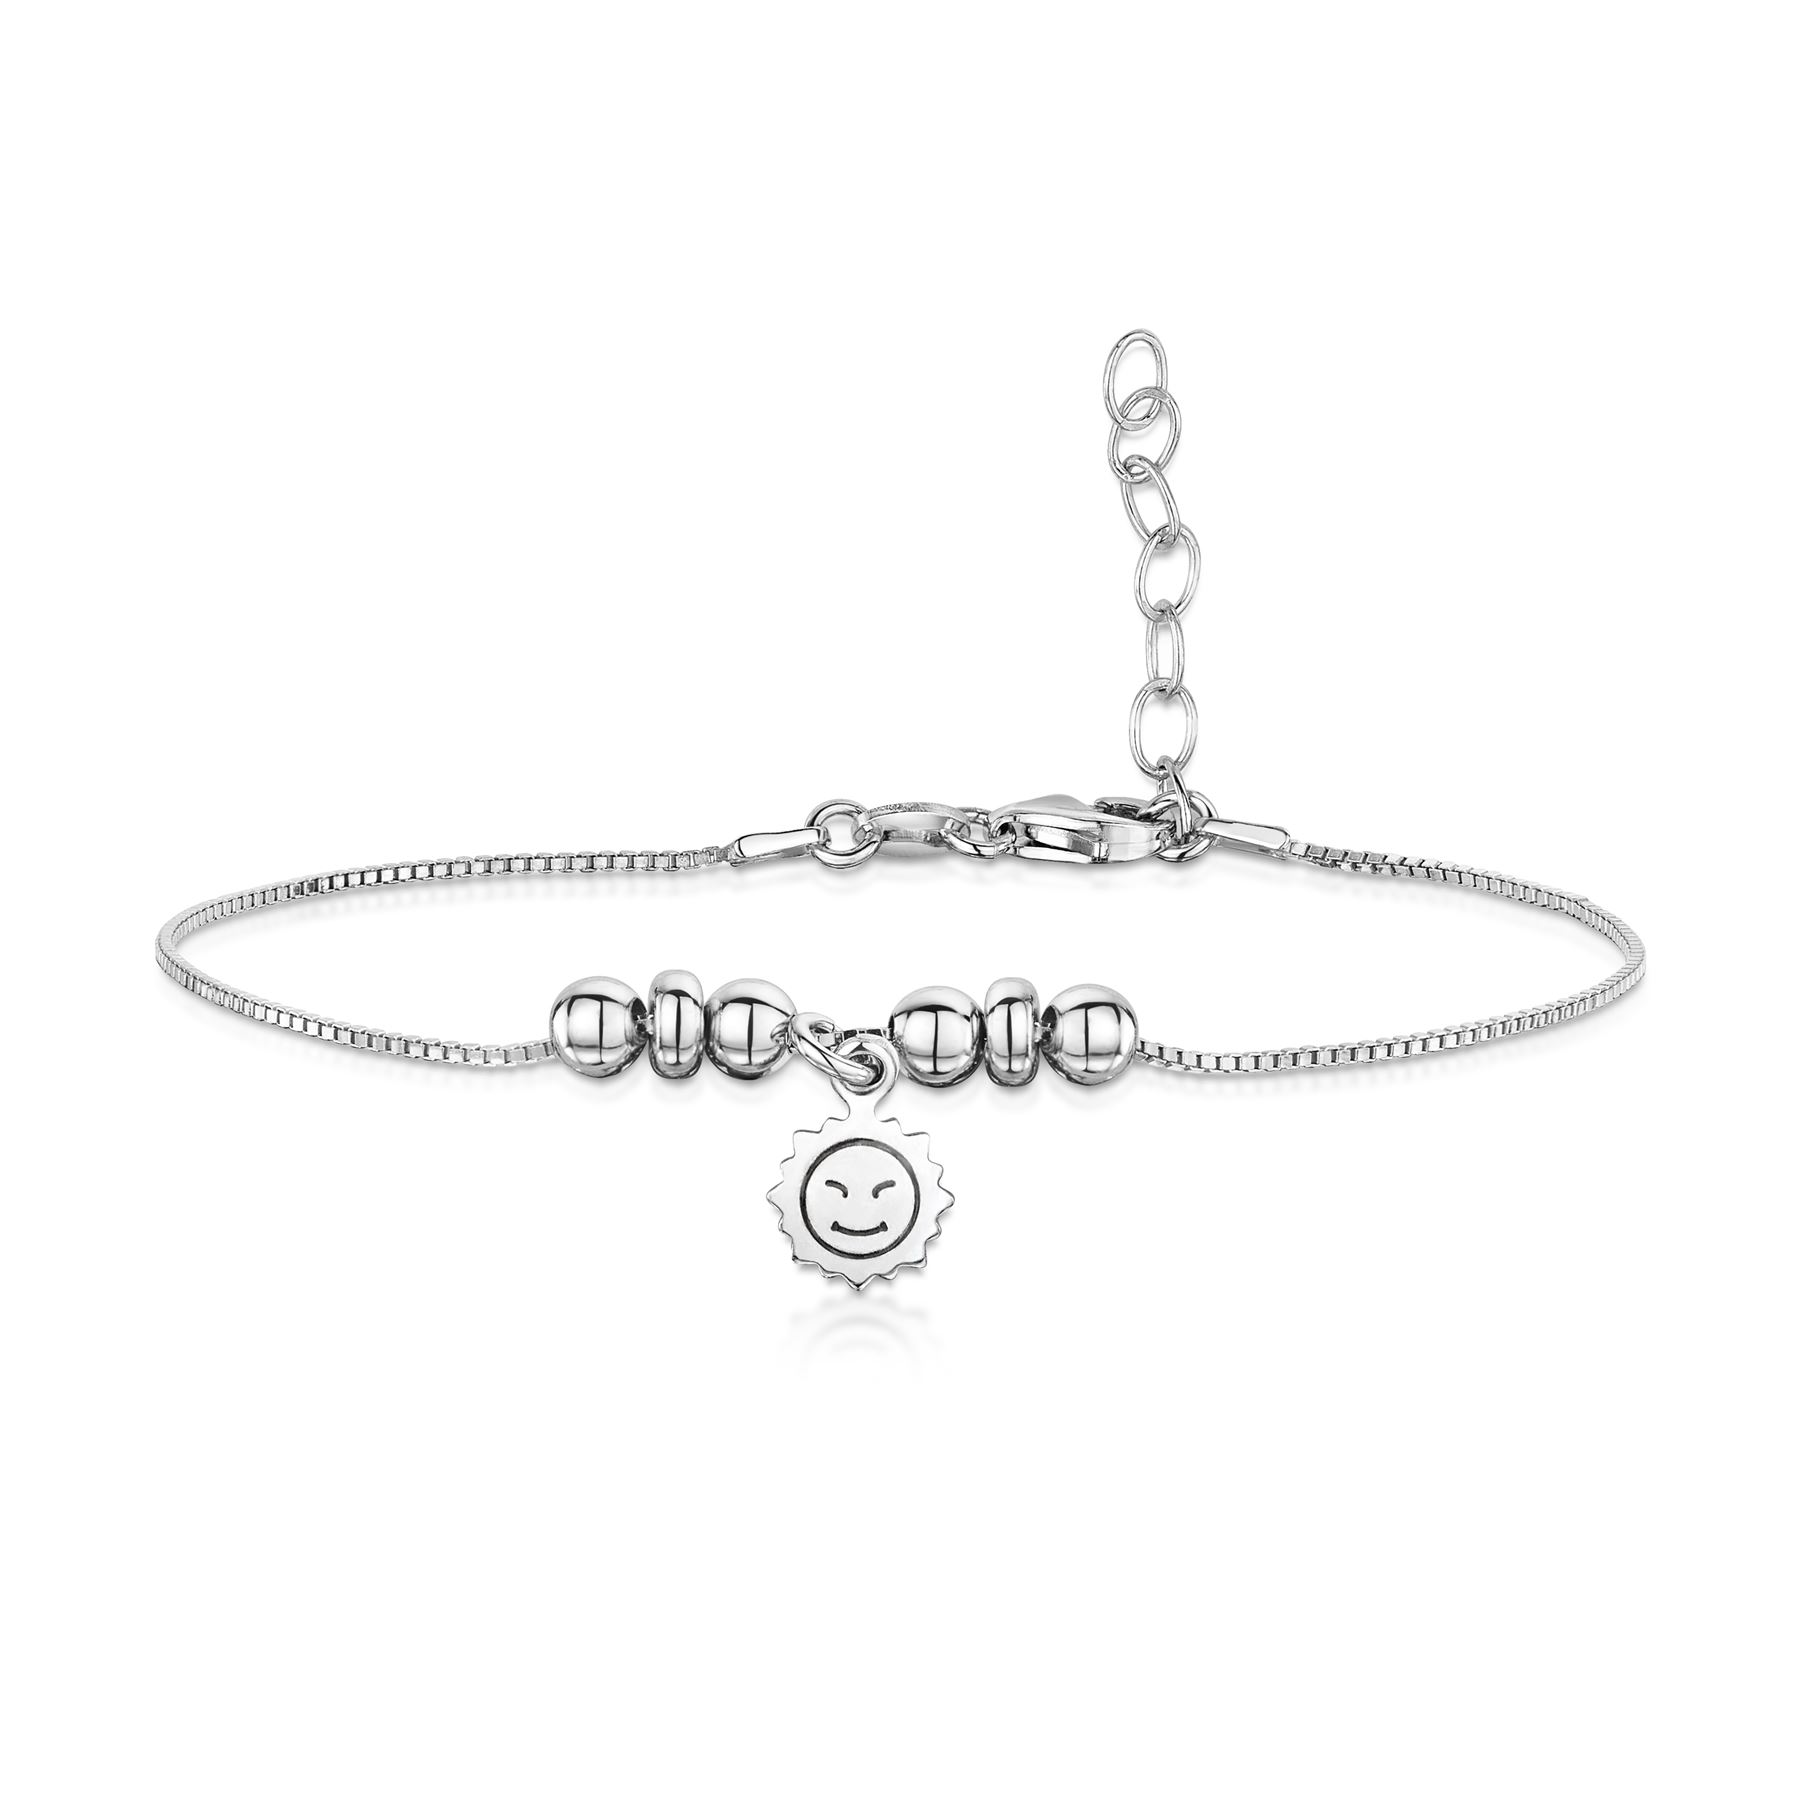 Amberta-Jewelry-925-Sterling-Silver-Adjustable-Bracelet-Italian-Bangle-for-Women miniature 9